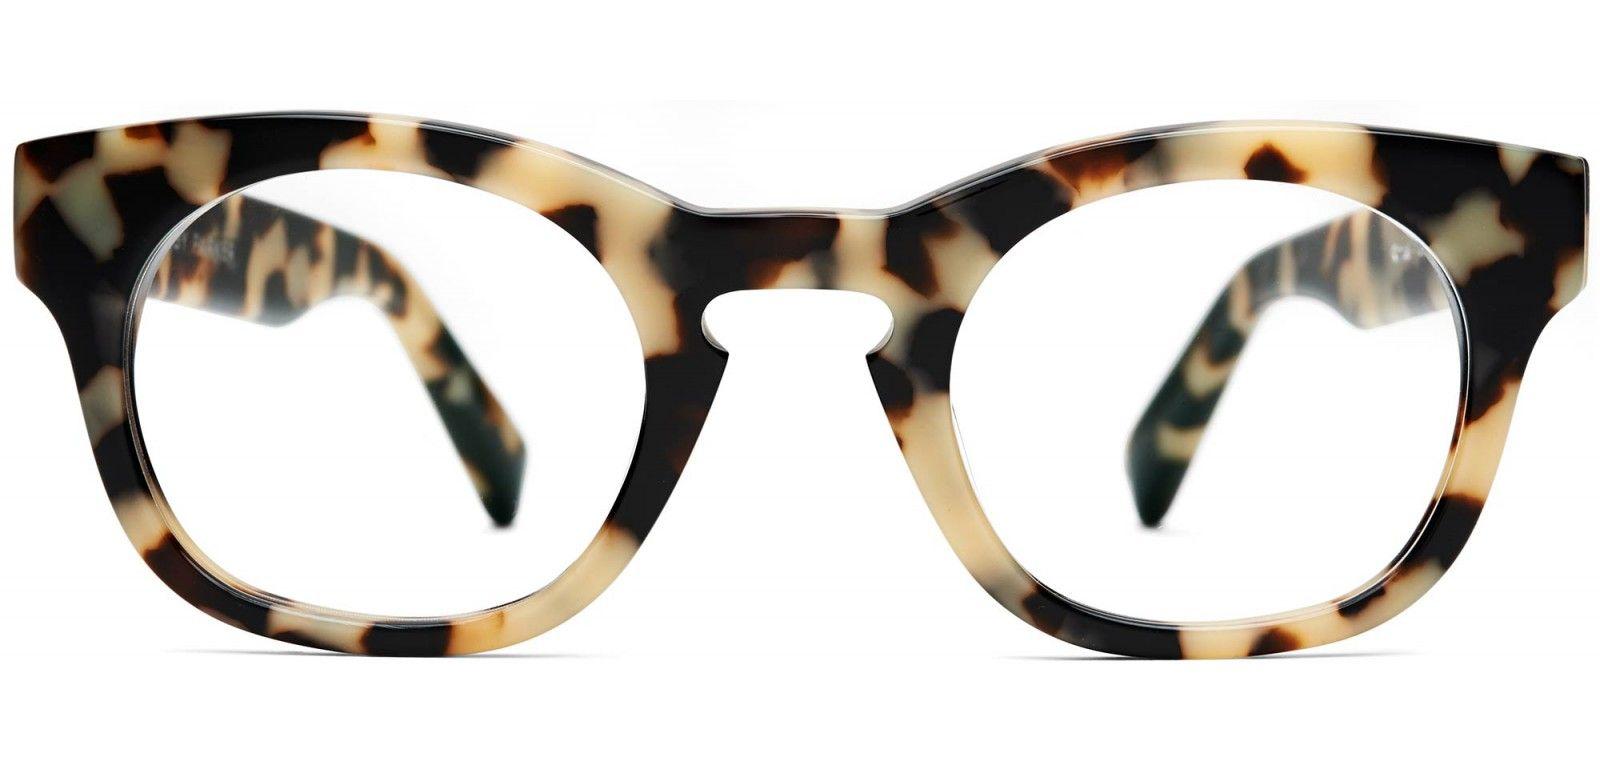 Kimball eyeglasses in marzipan tortoise for women